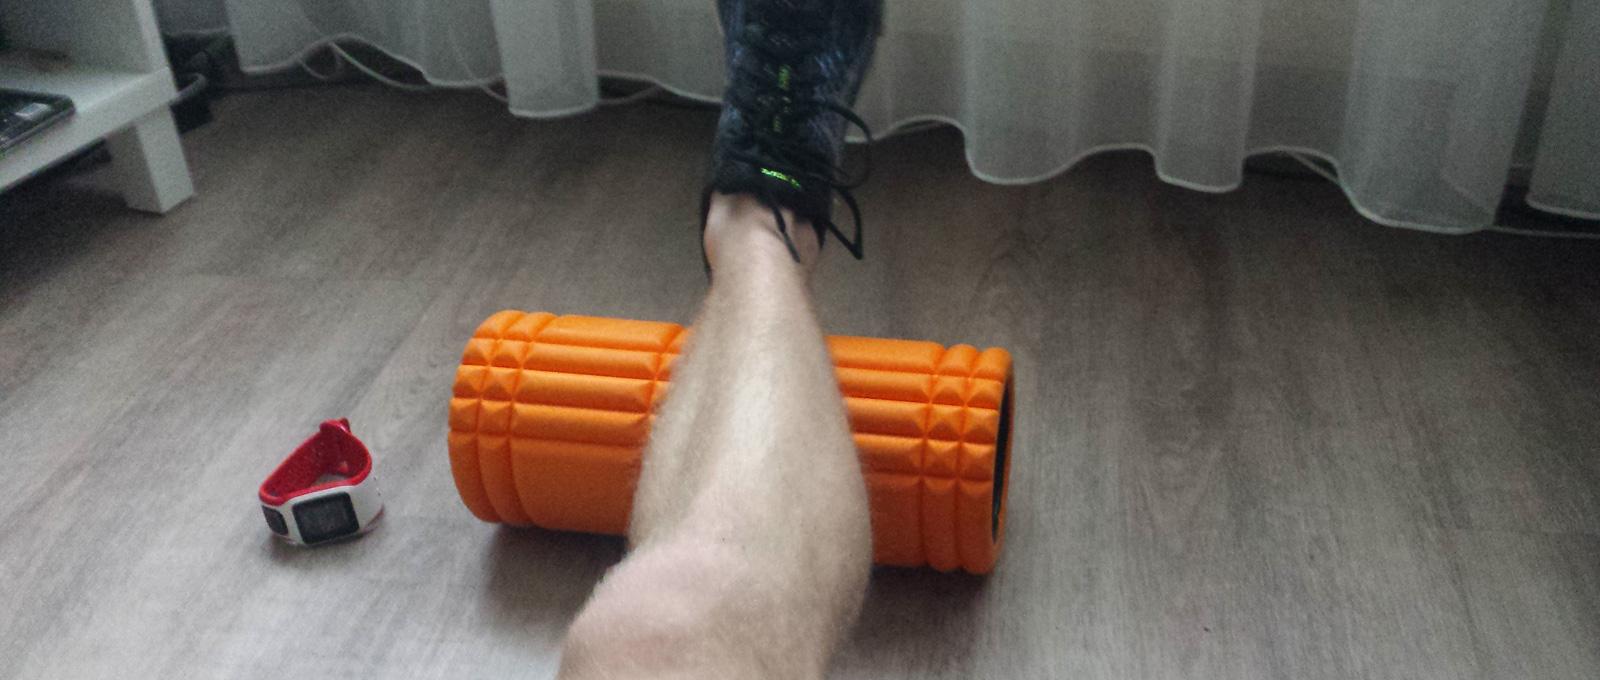 Jorin-Kamps-foamroller